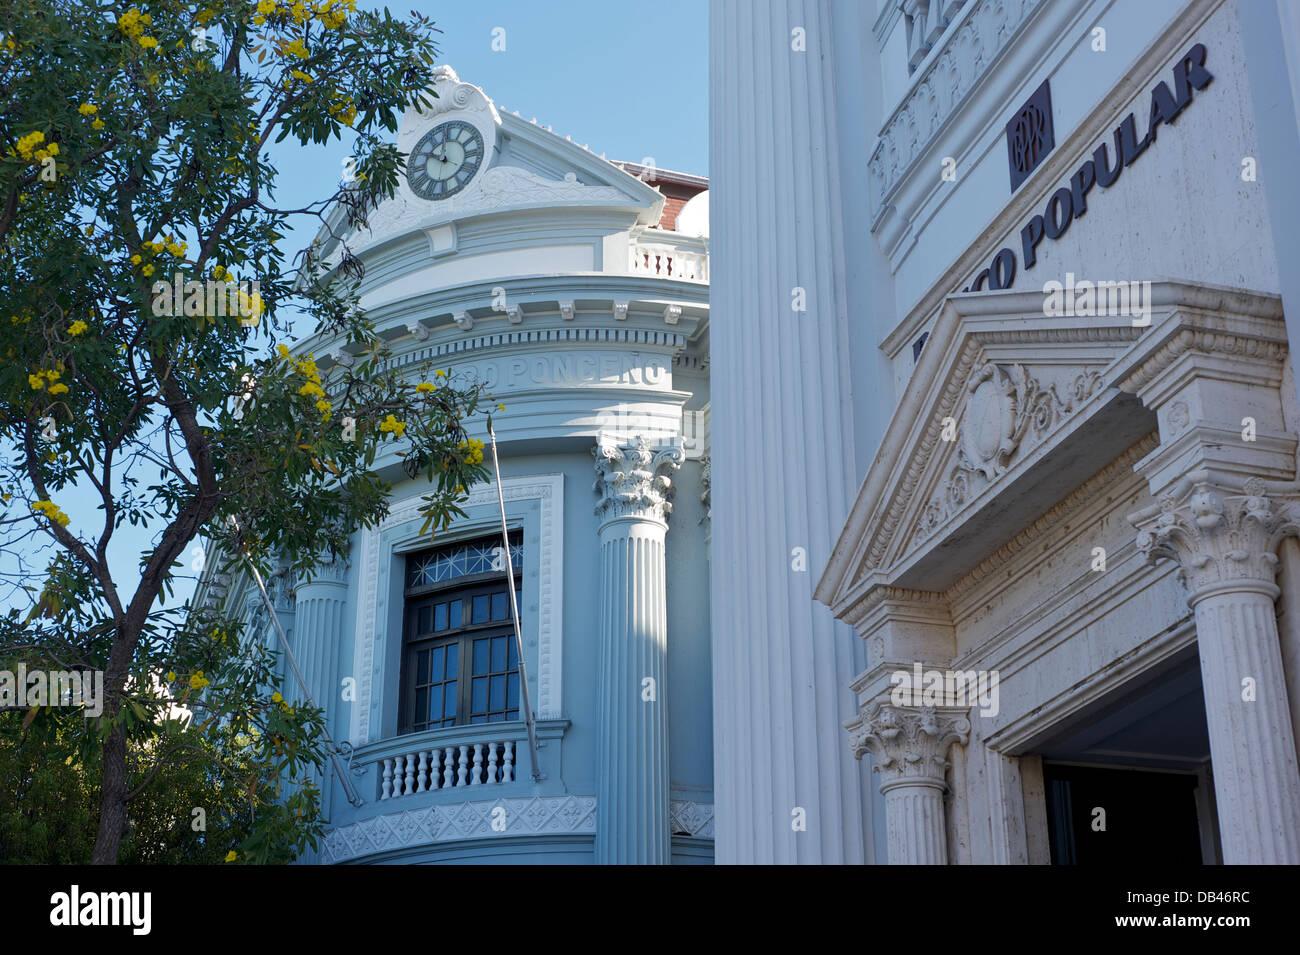 Detalle arquitectónico, Ponce, Puerto Rico Imagen De Stock